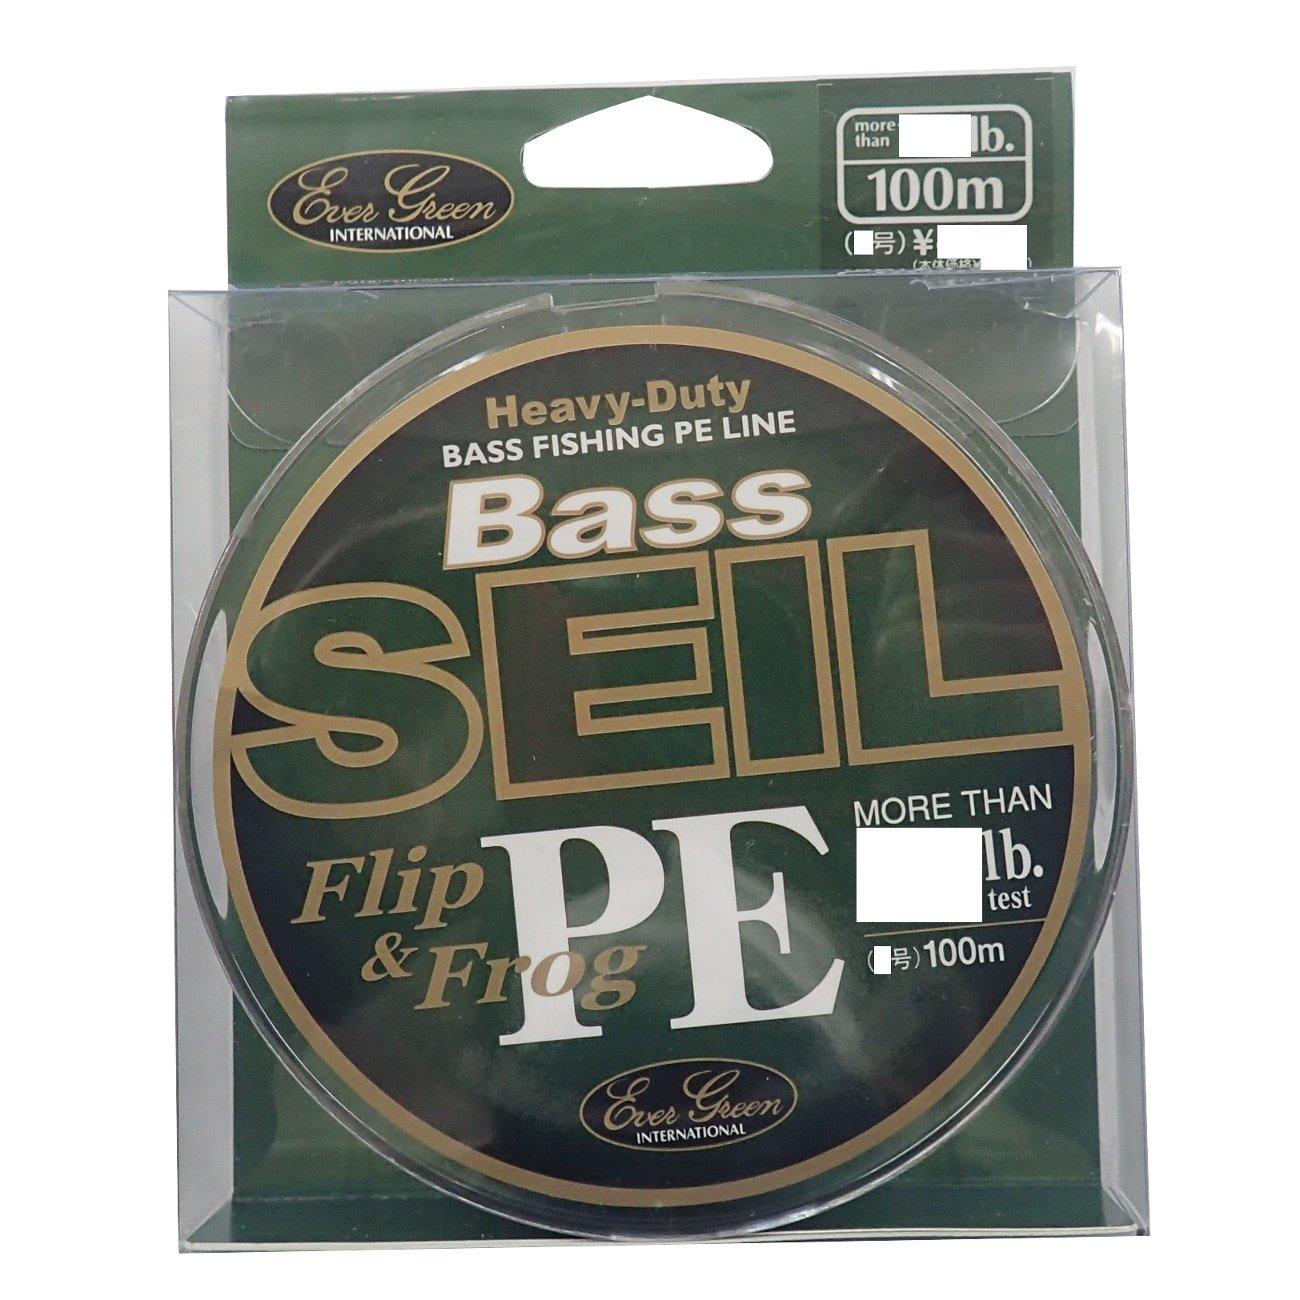 EverGrün P.E Line Bass Seil Flip & Frog Heavy Duty 100m 80lb (5295)